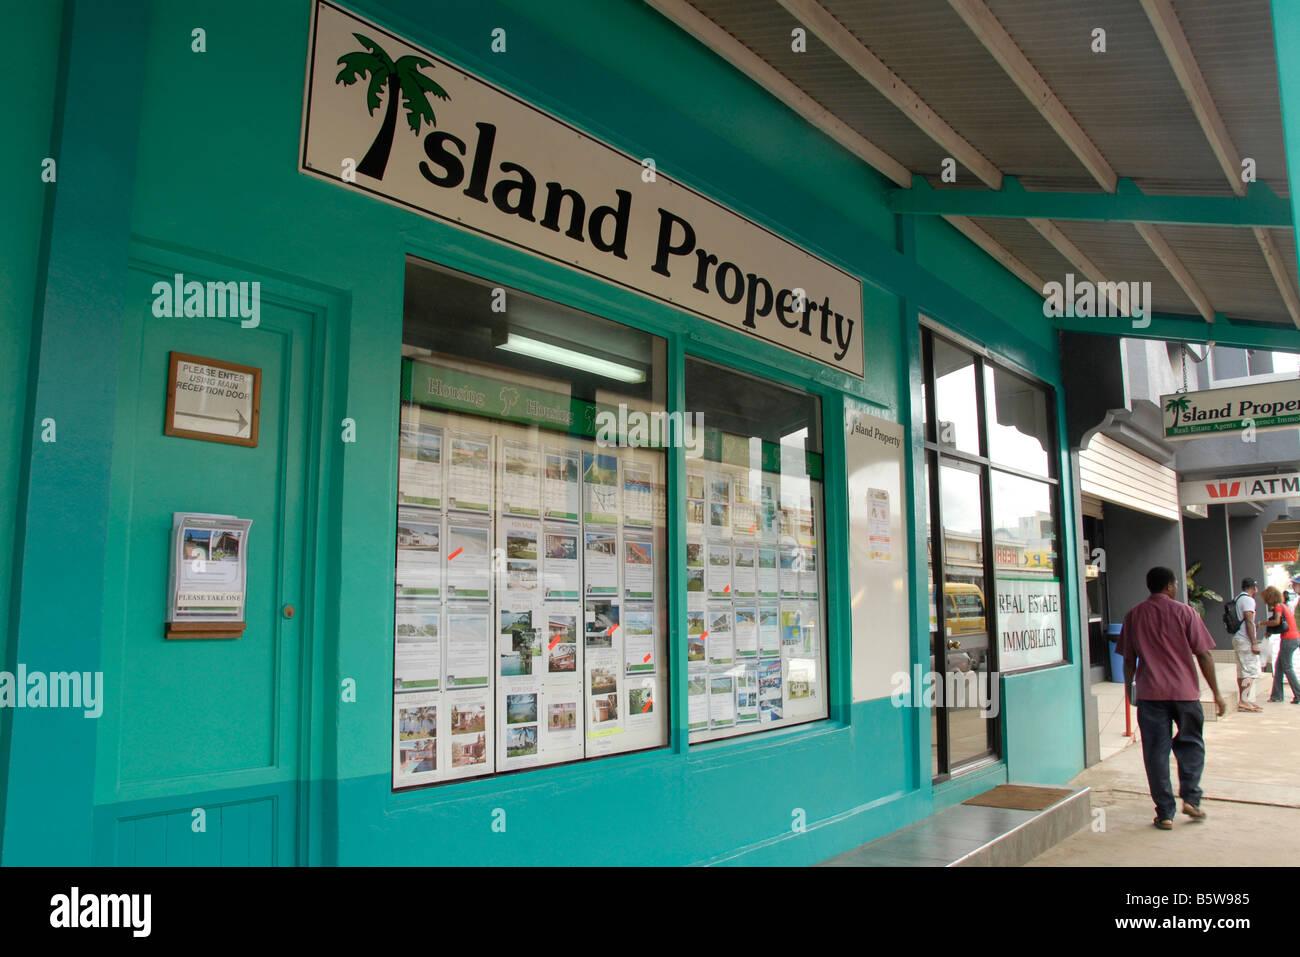 Island property shop Port Vila Efate island Vanuatu - Stock Image